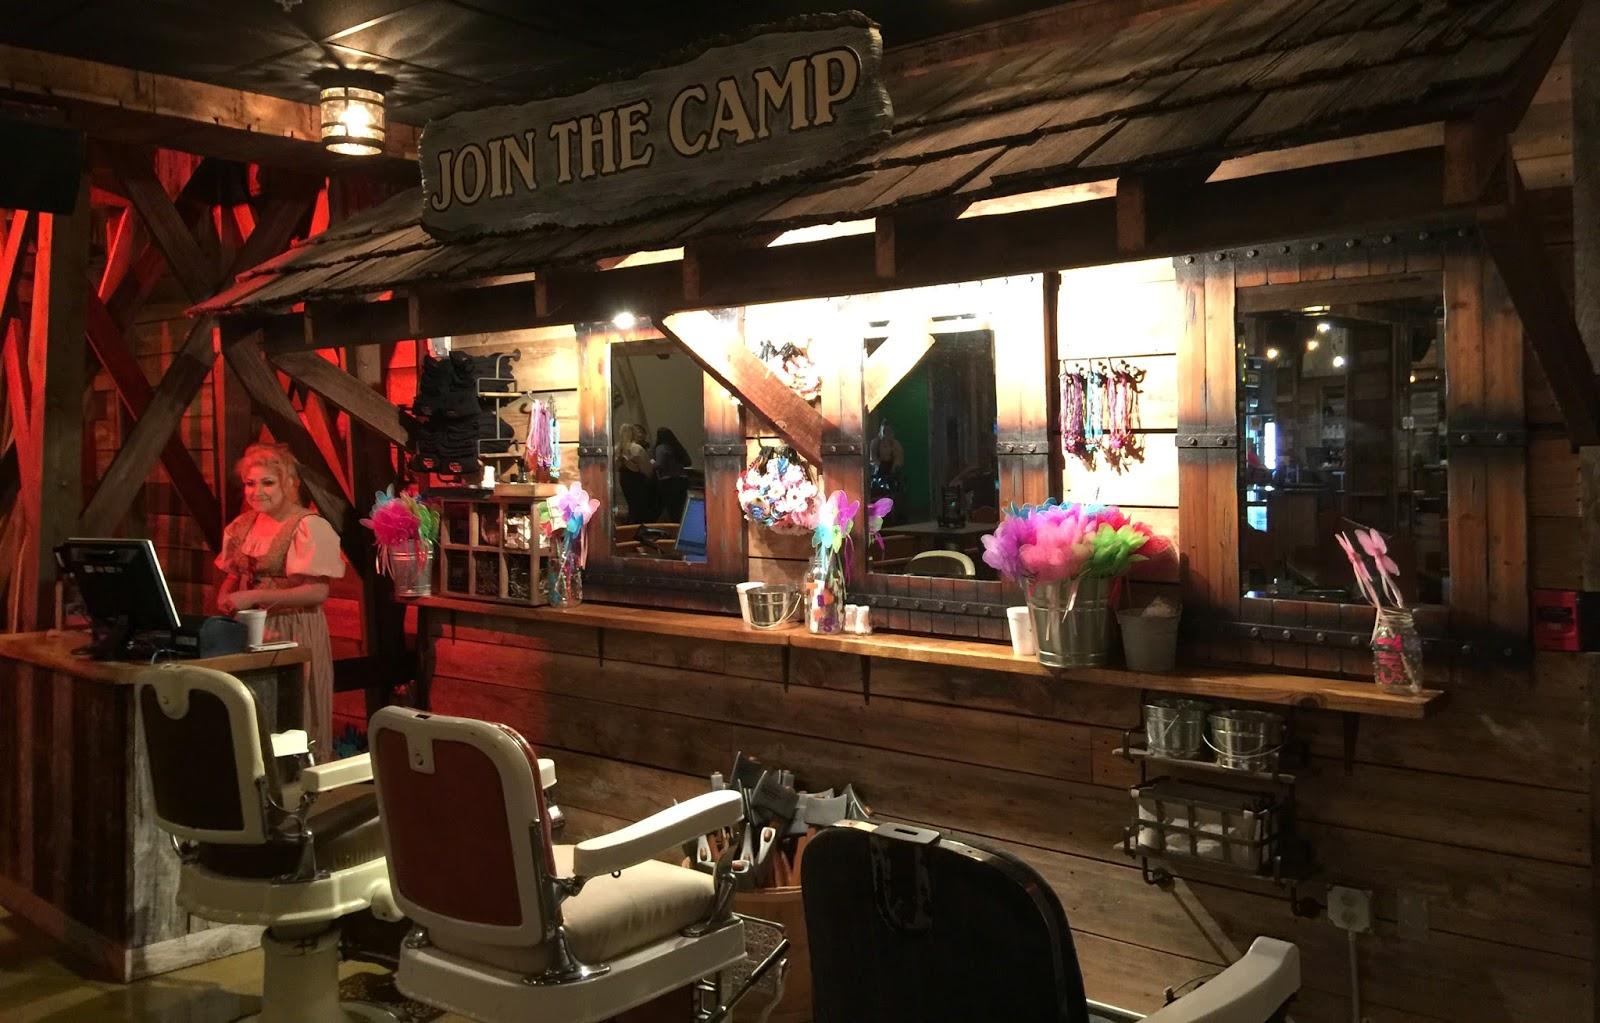 Dolly S Lumberjack Adventure Show Review Gatlinburg Tn